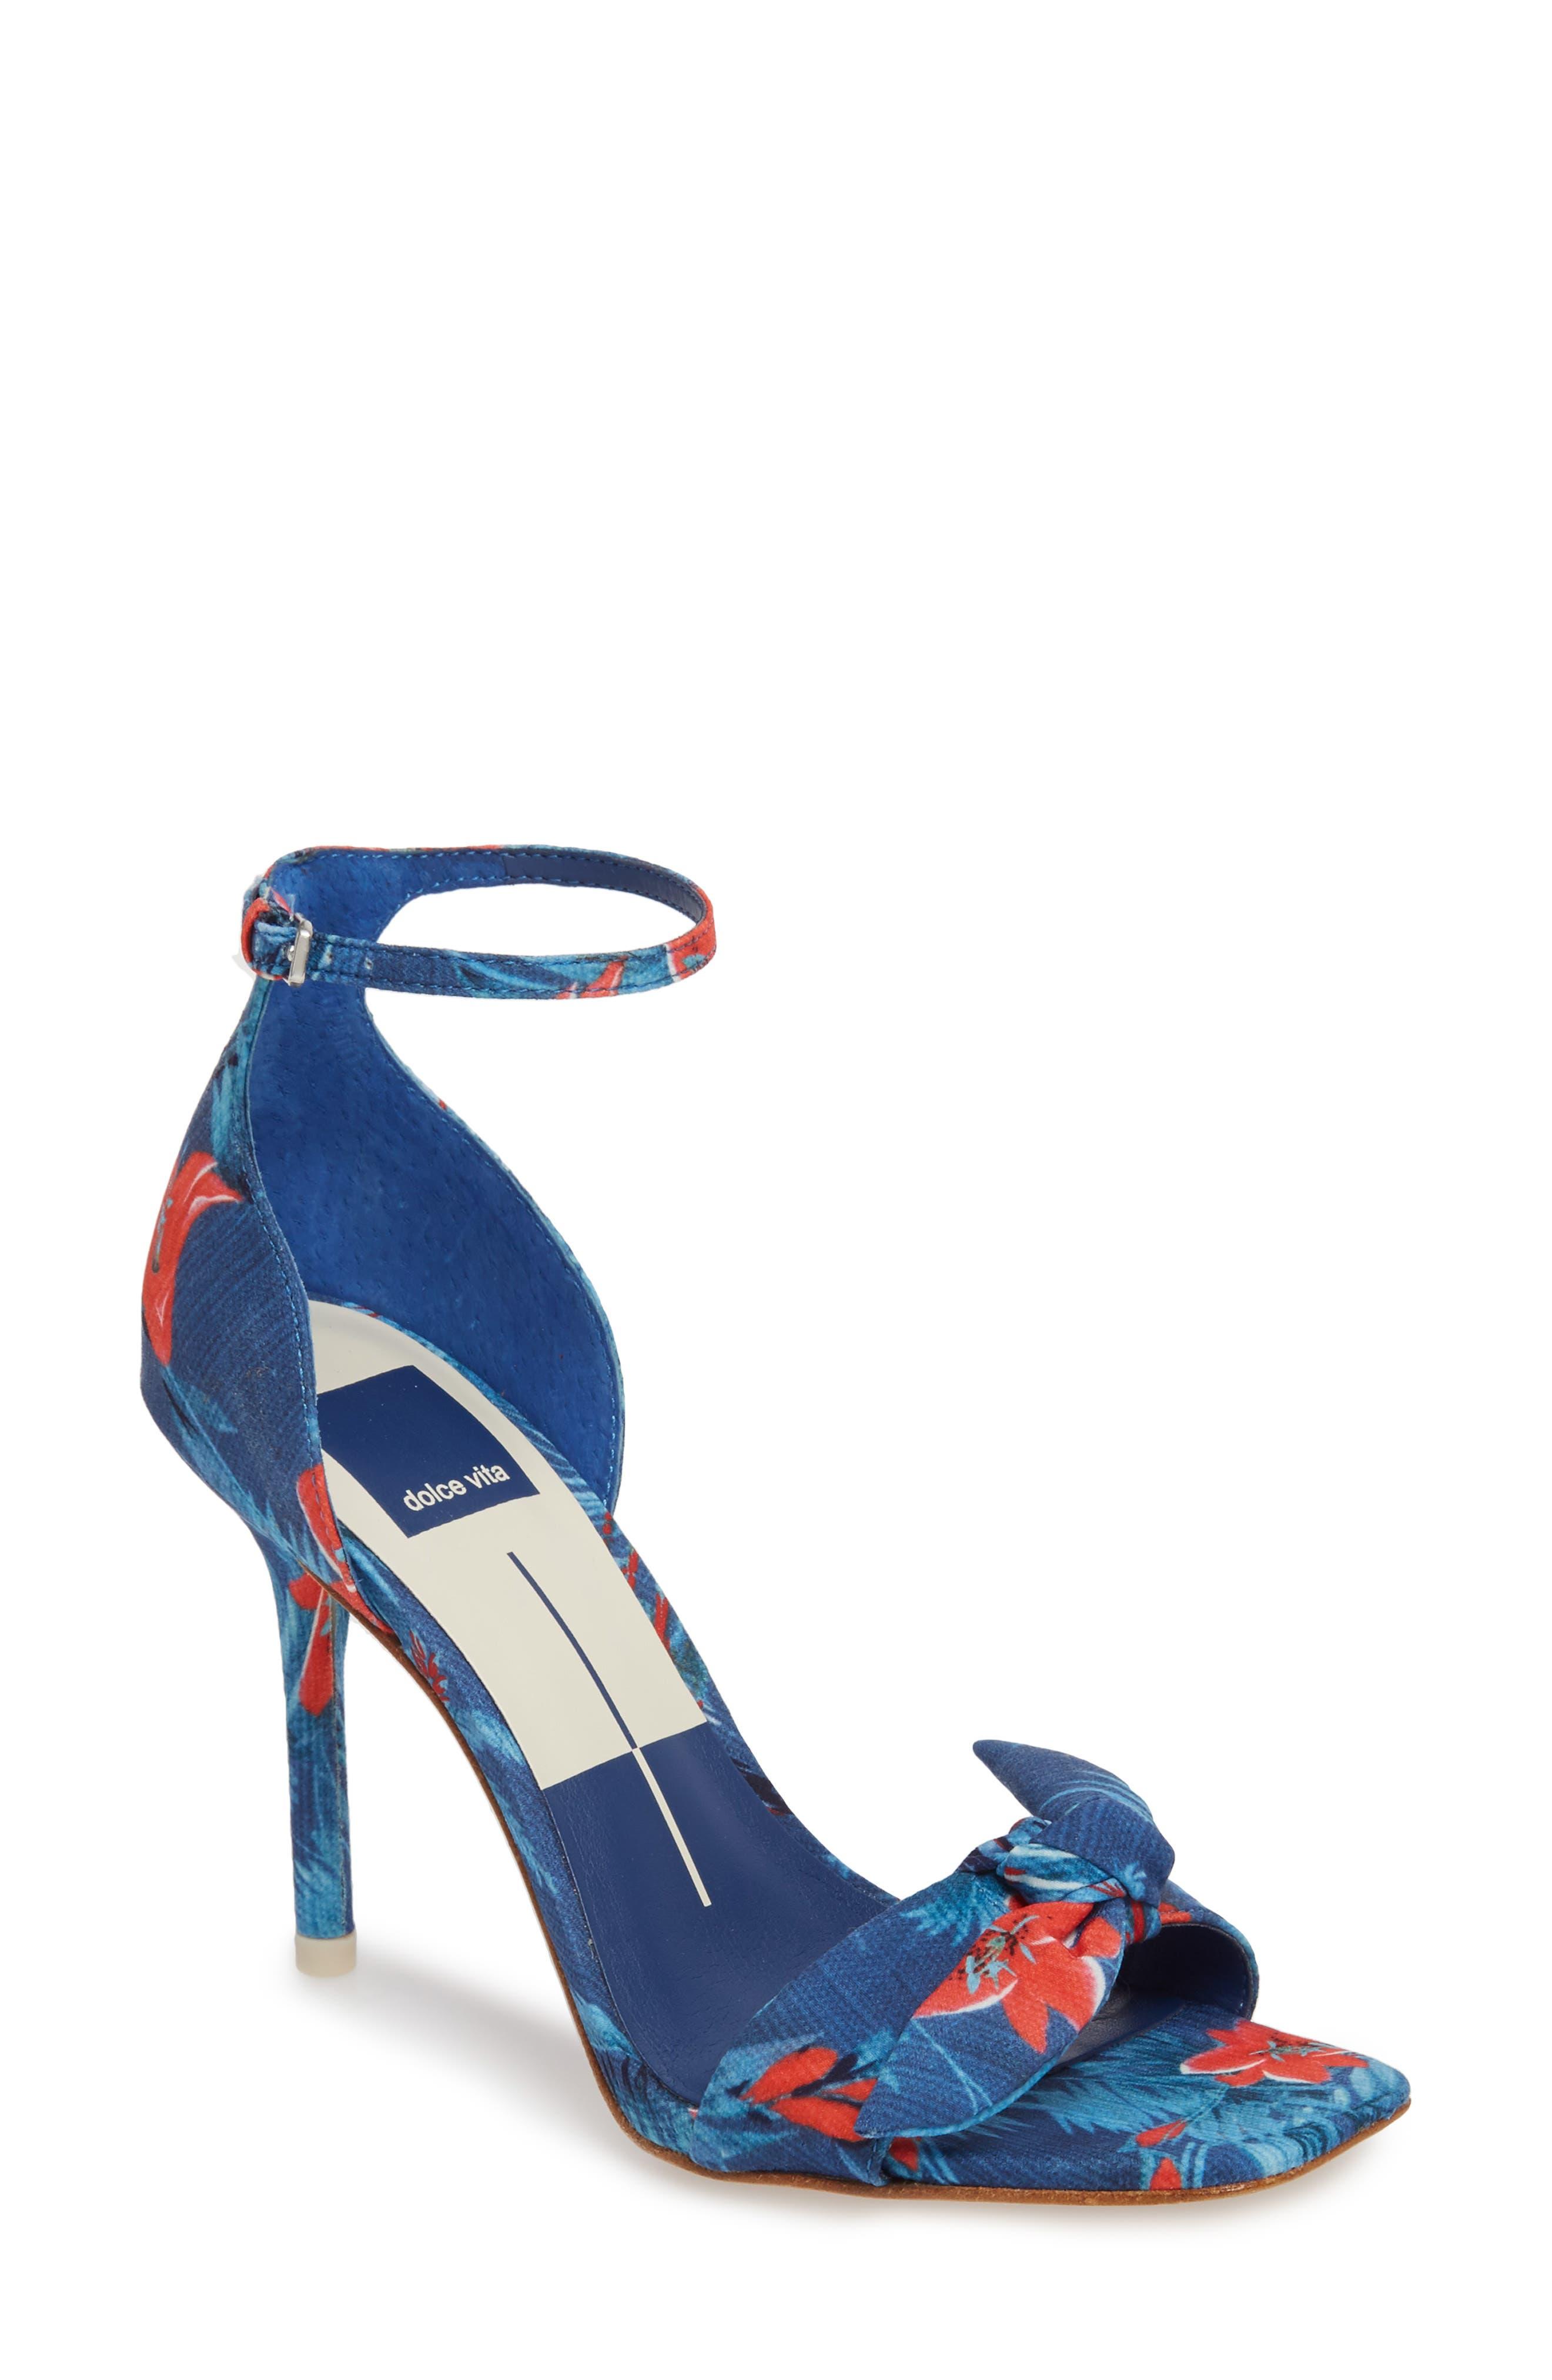 Helana Knotted Sandal,                             Main thumbnail 1, color,                             Blue Multi